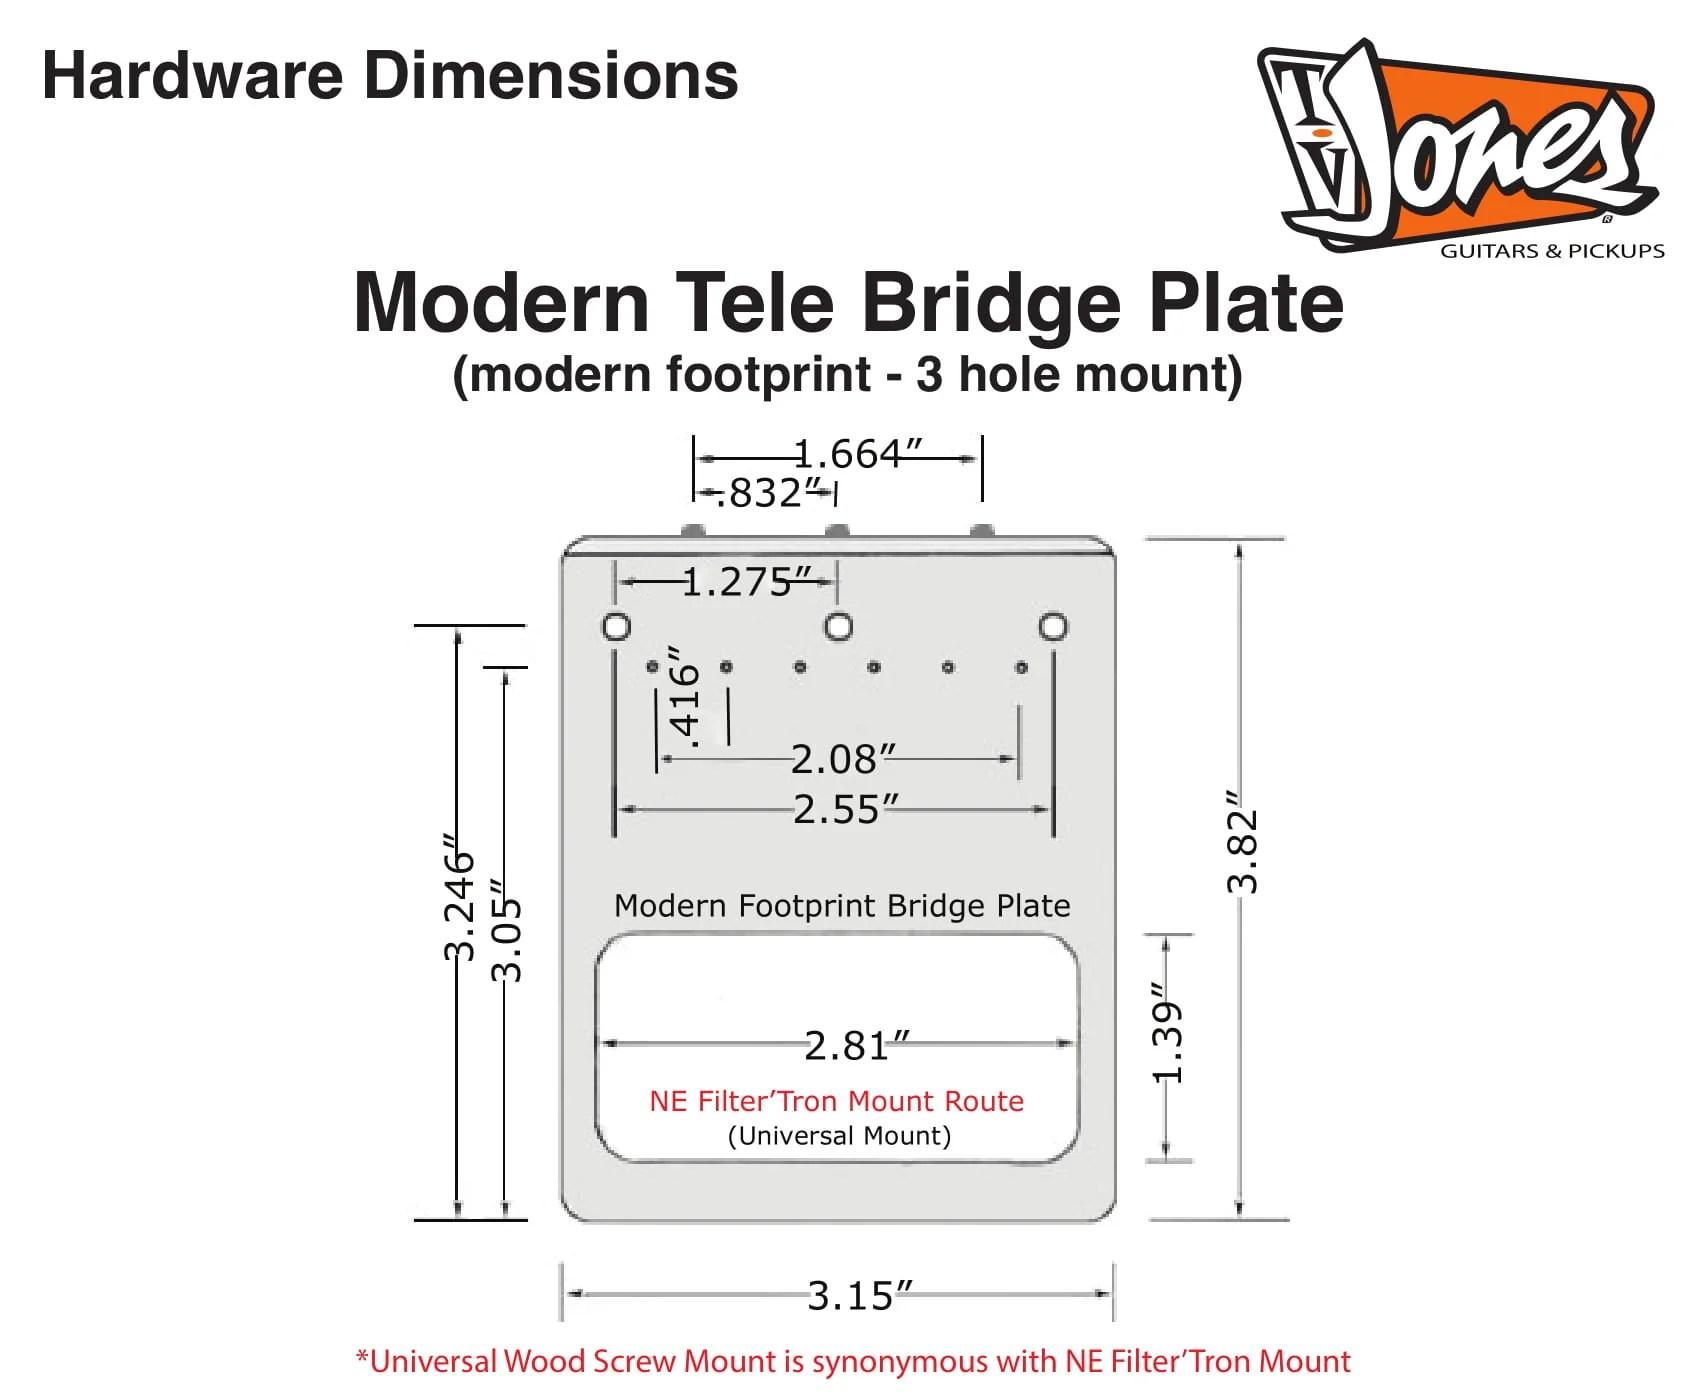 modern vs original the modern tele bridge plate mounts with 3 holes and the original tele bridge plate mounts with 4 holes  [ 1700 x 1400 Pixel ]